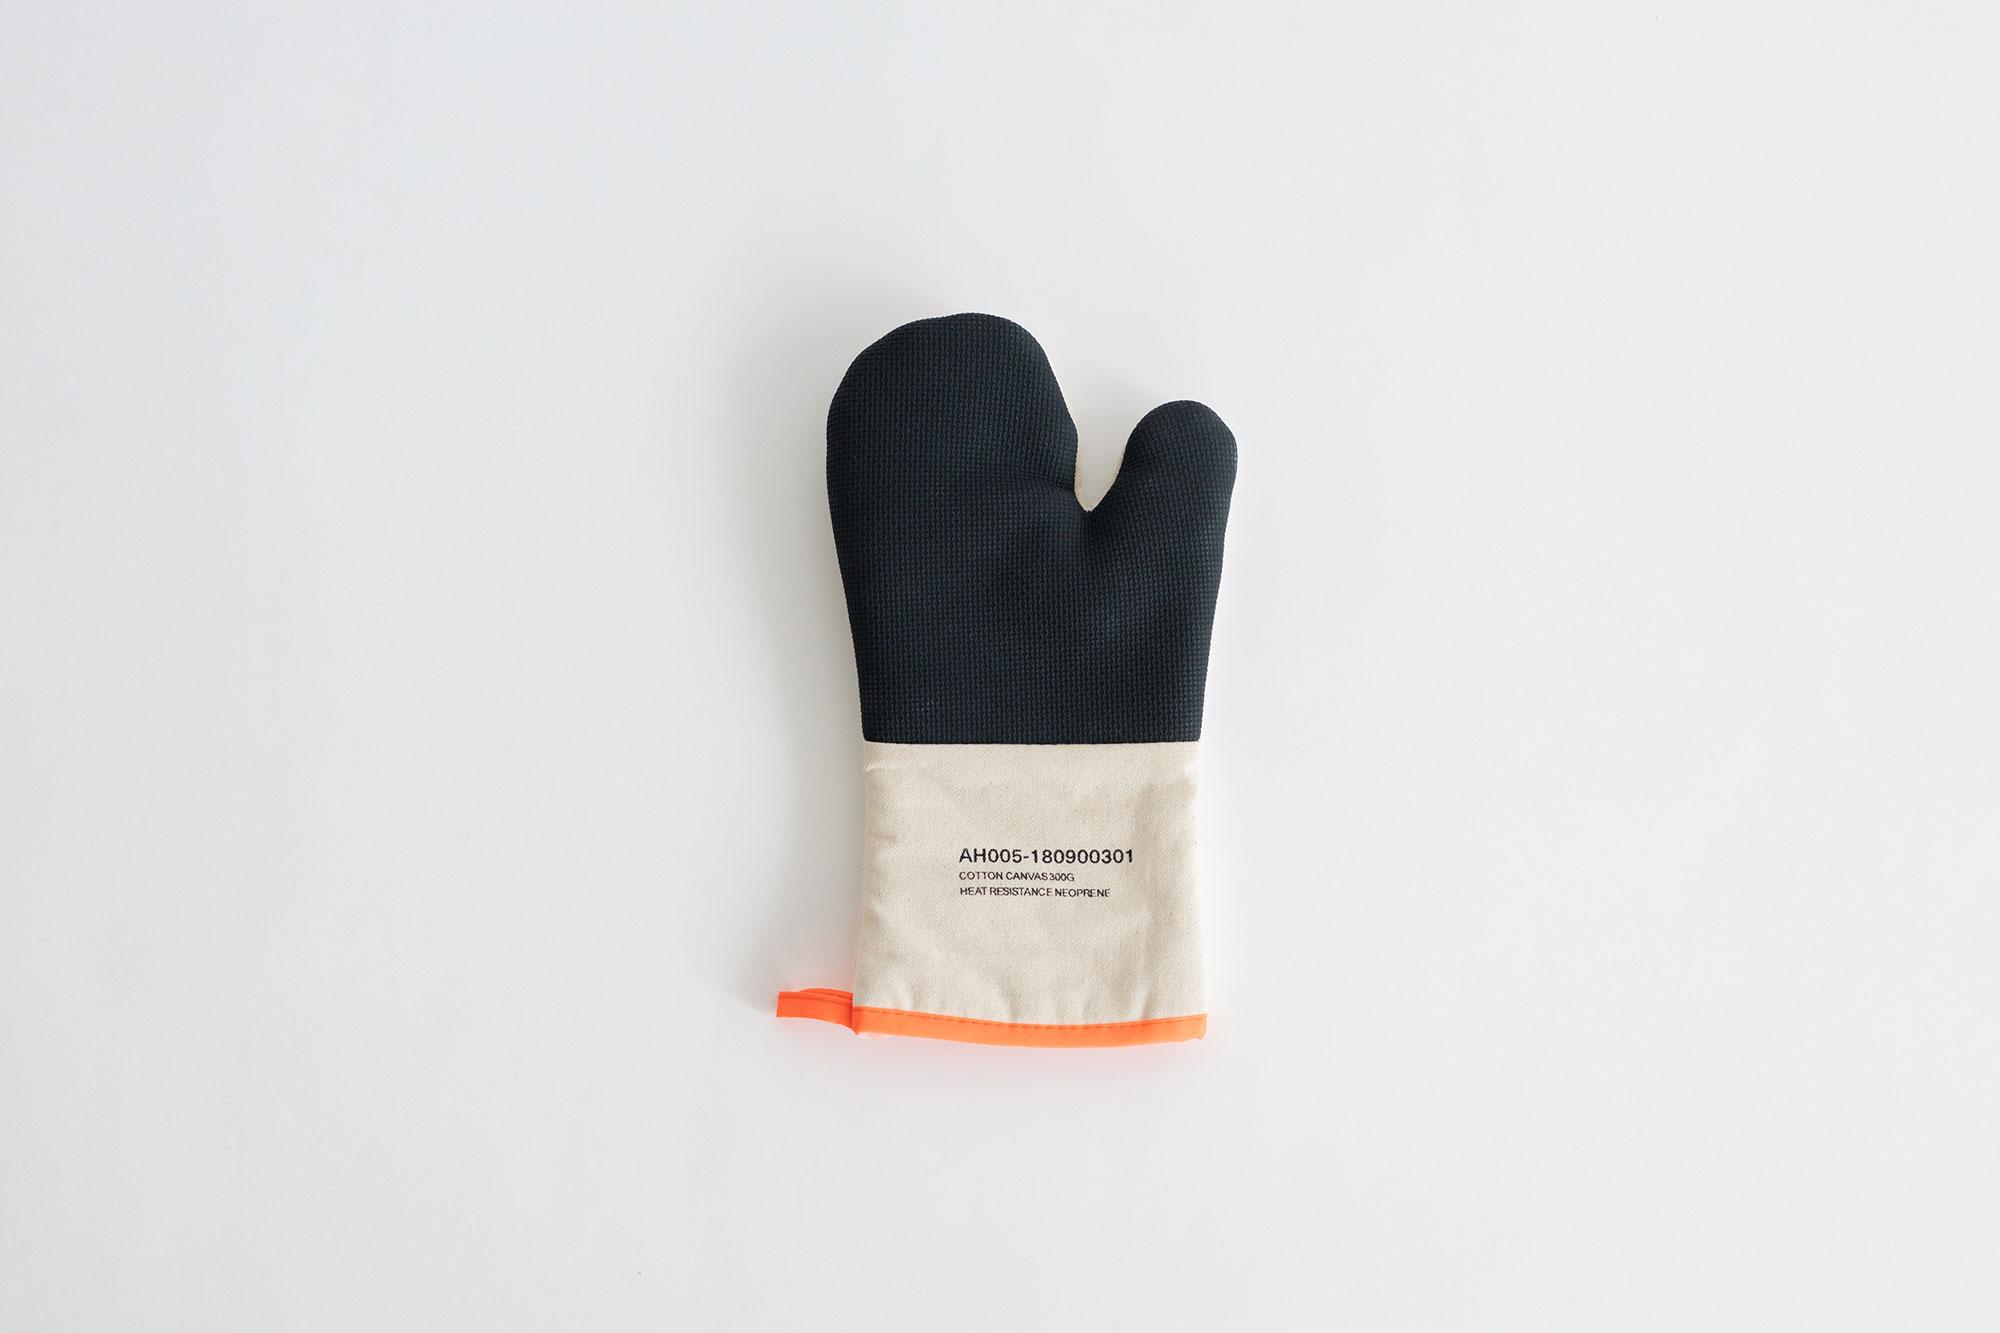 ANAheim household goods オーブングローブ オレンジ